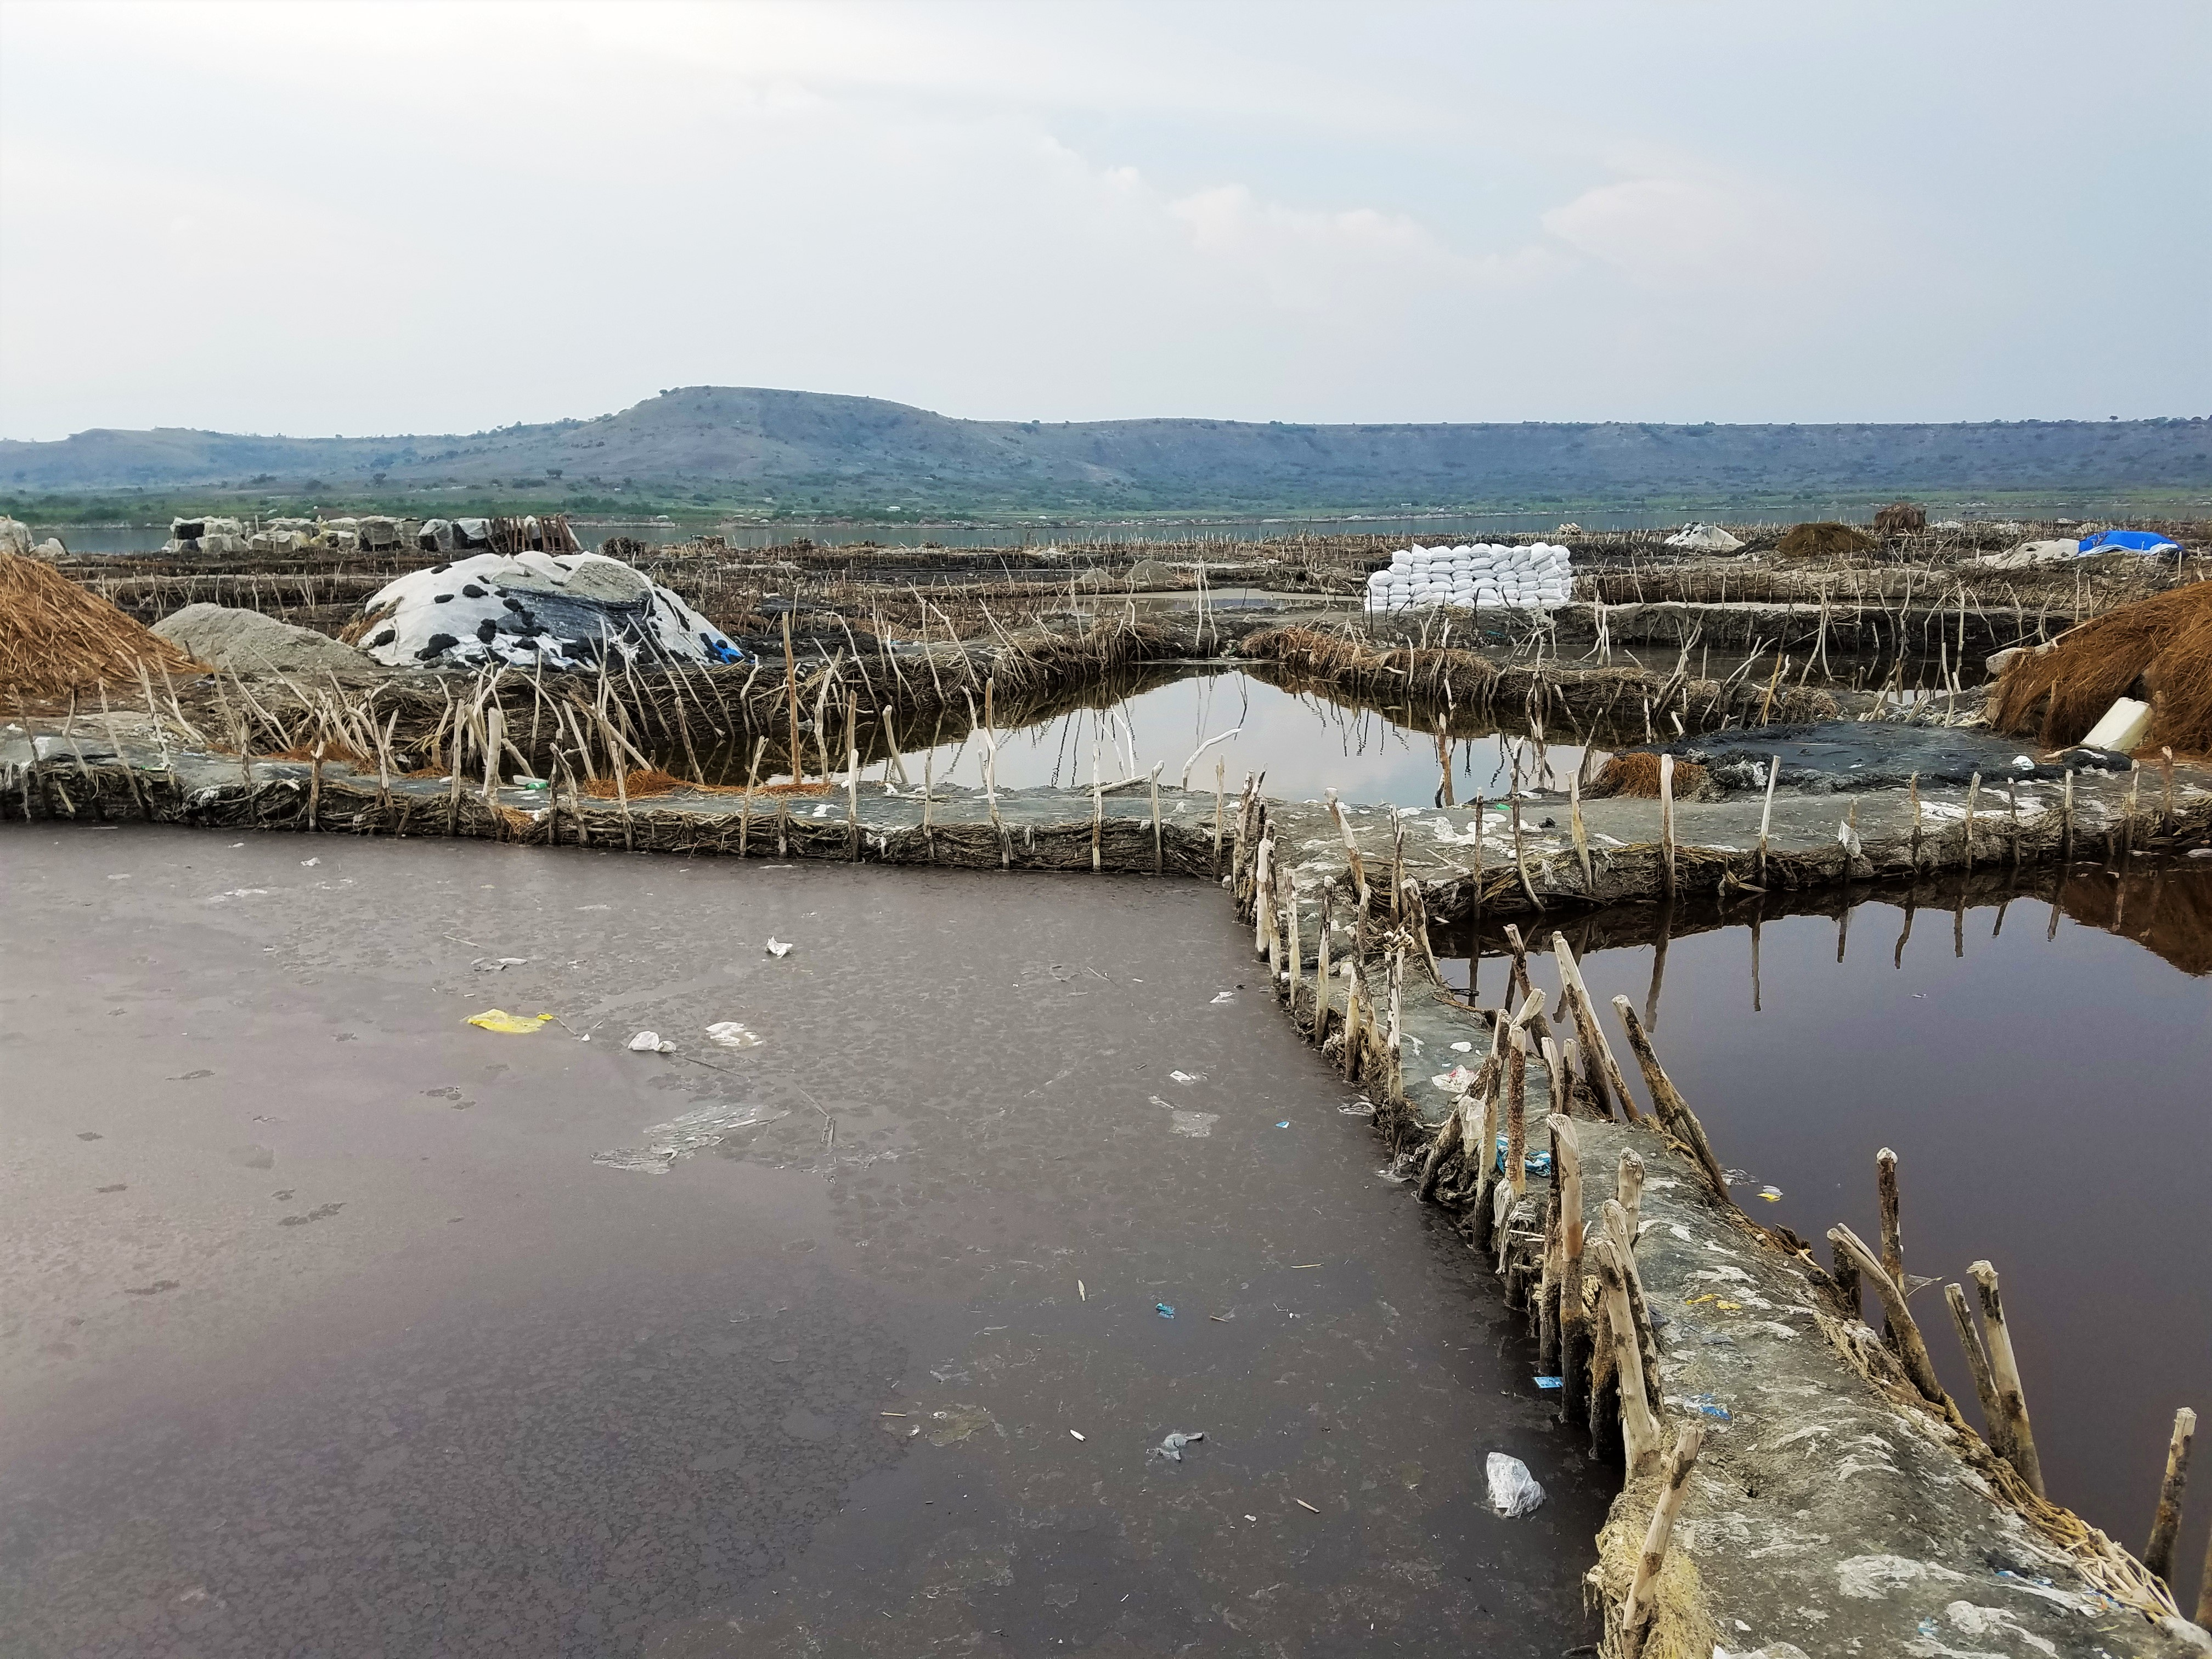 Salt mine, brine, Uganda, Red Chili, Queen Elizabeth National Park